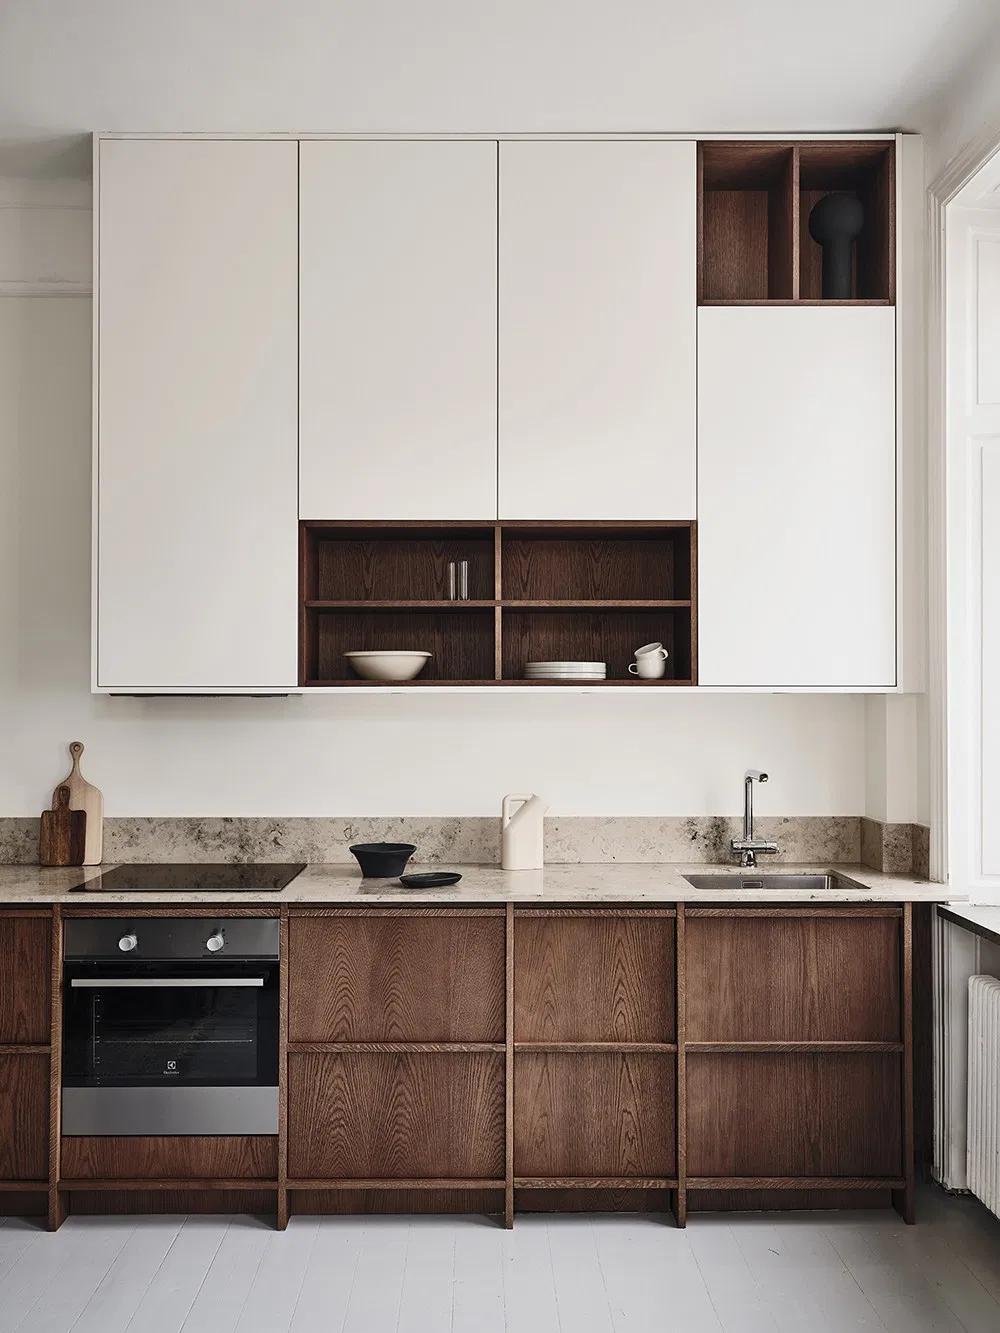 The Oak Kitchens By Nordiska Kok In 2020 Keuken Design Keuken